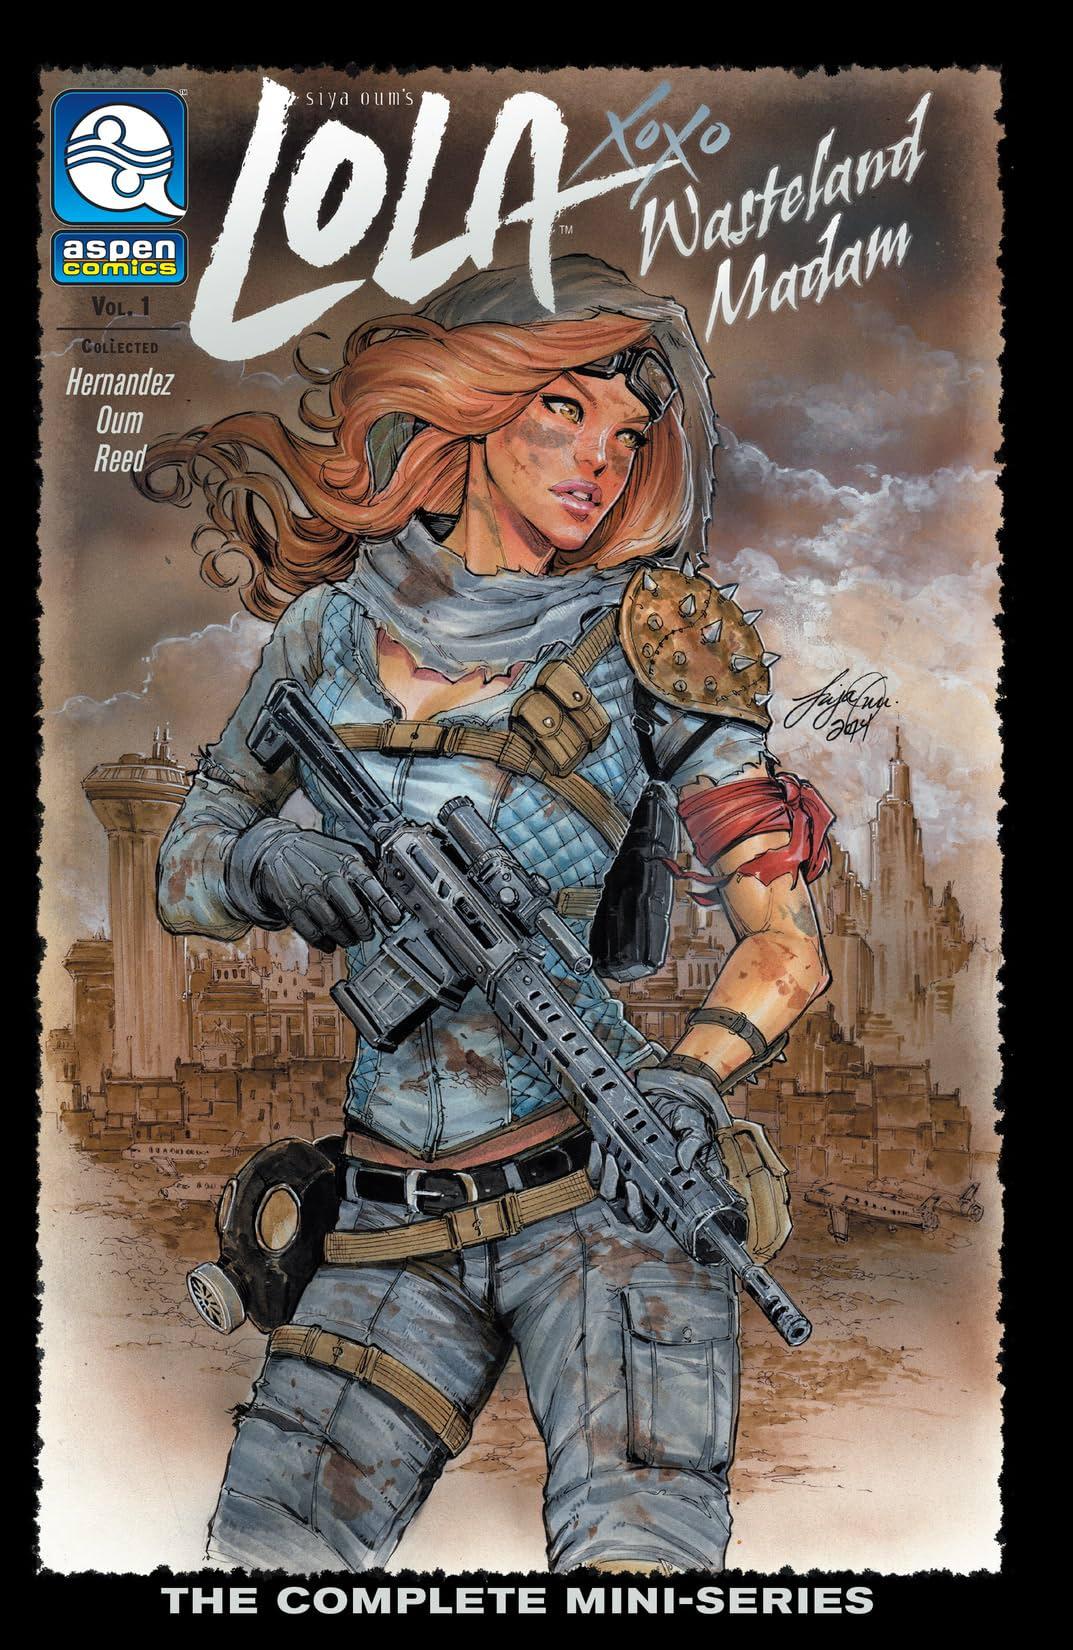 Lola XOXO: Wasteland Madam Vol. 1